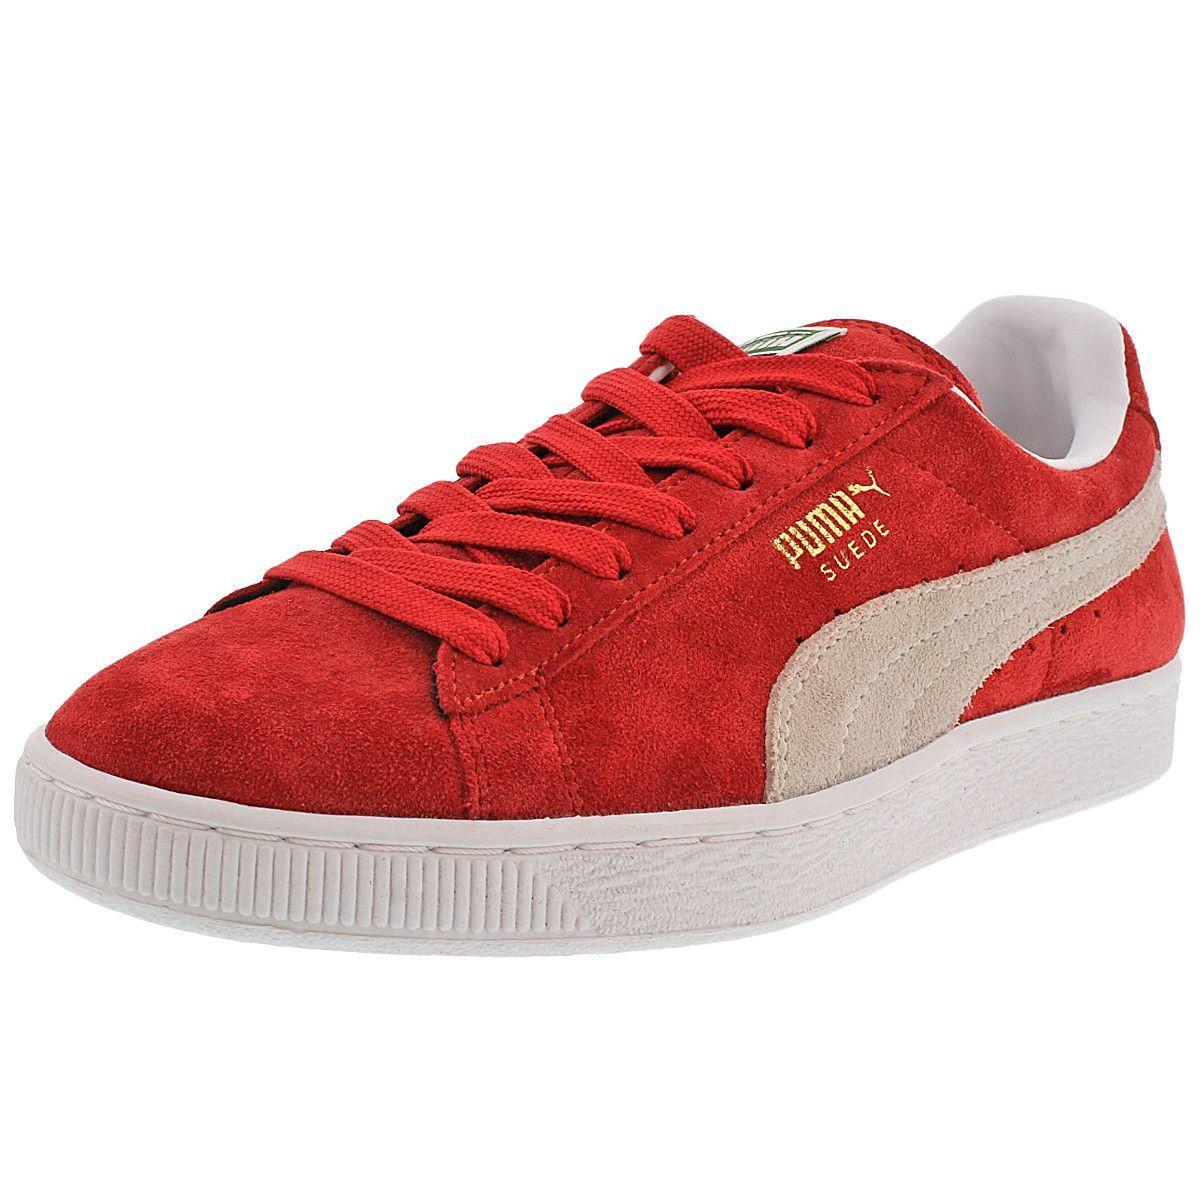 1665fd6d3333 Puma - Men s Suede Classic + Low Sneaker - High Risk Red White ...